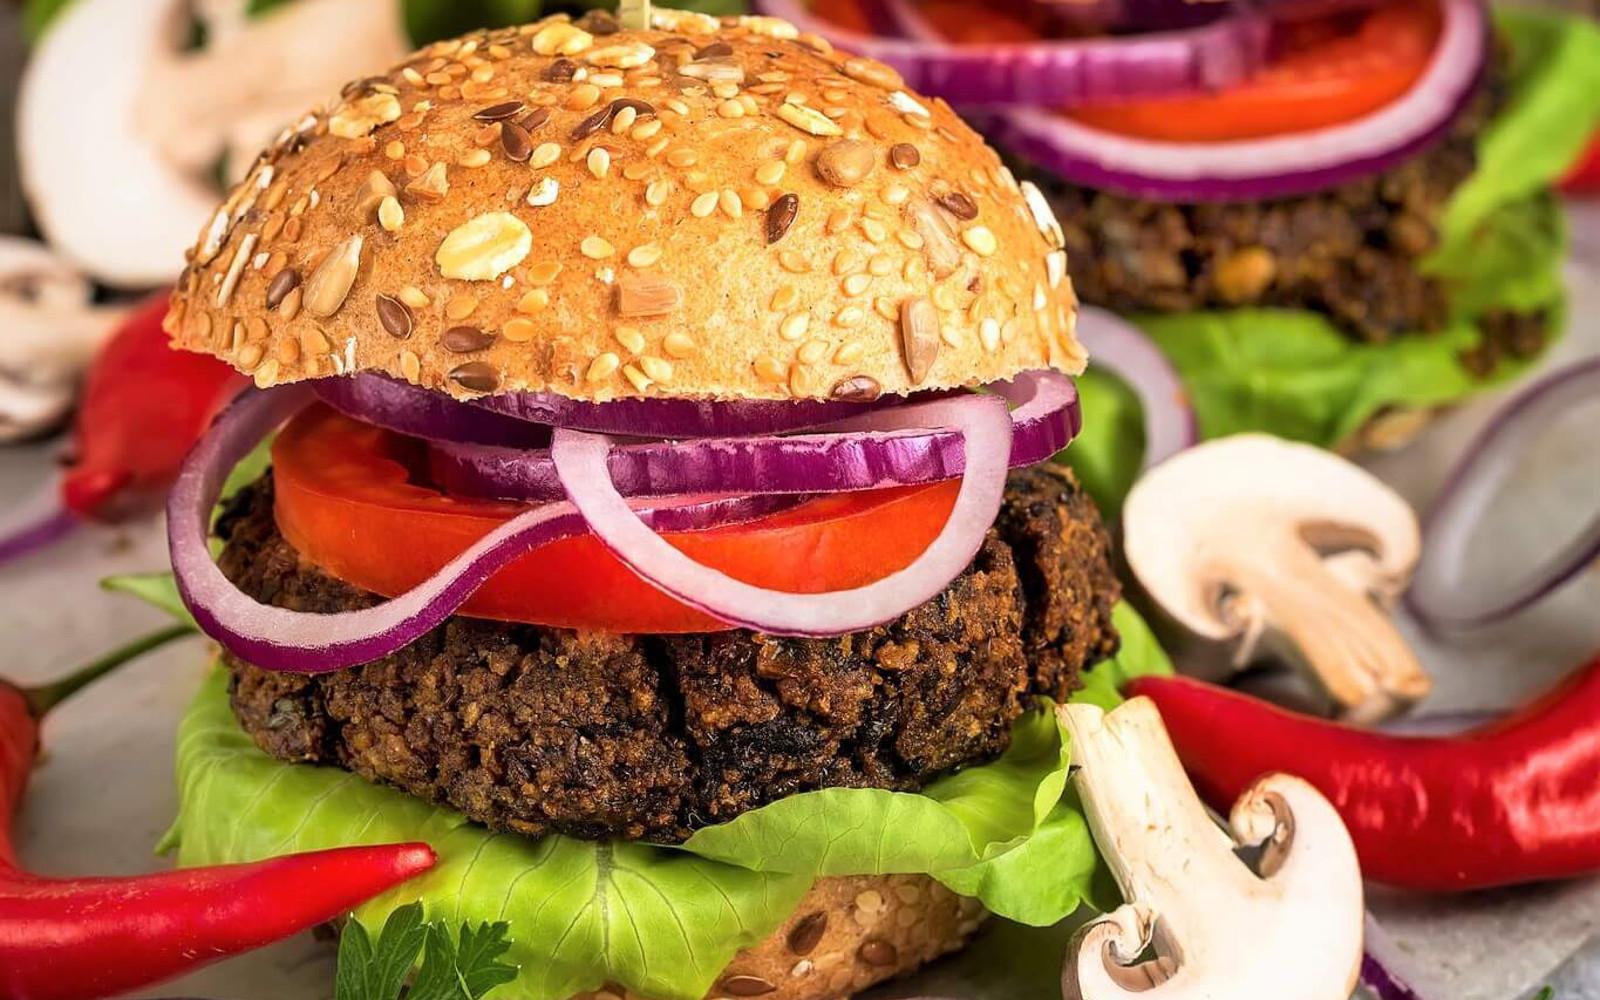 Vegan Gluten-Free Lentil and Mushroom Veggie Burgers